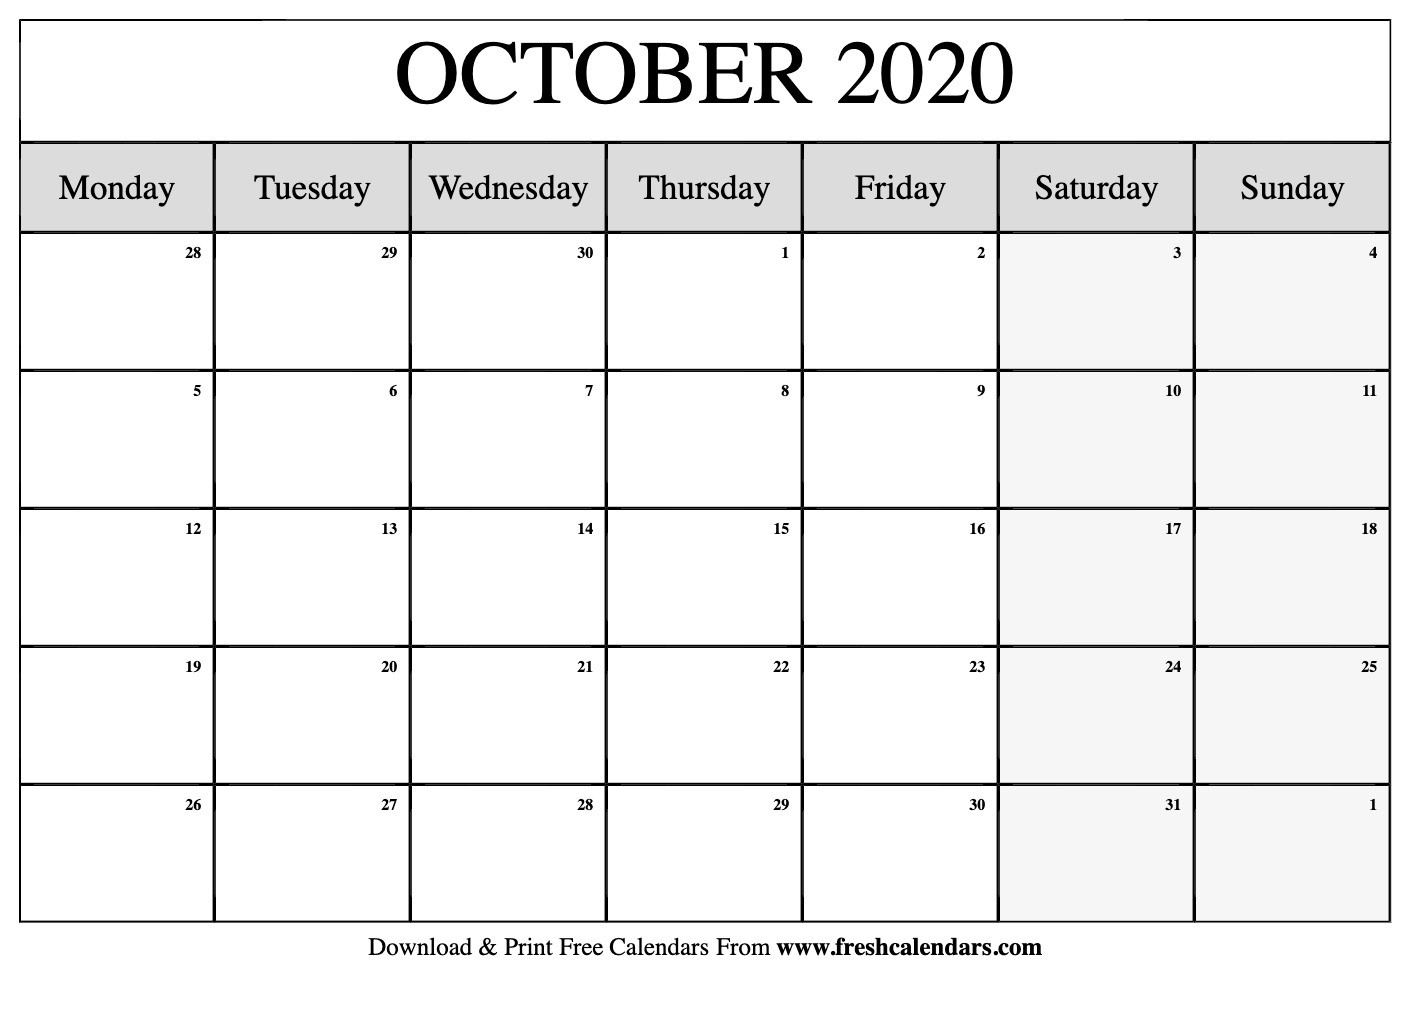 October 2020 Calendar Printable - Fresh Calendars-October 2020 Monthly Calendar Blank Printable